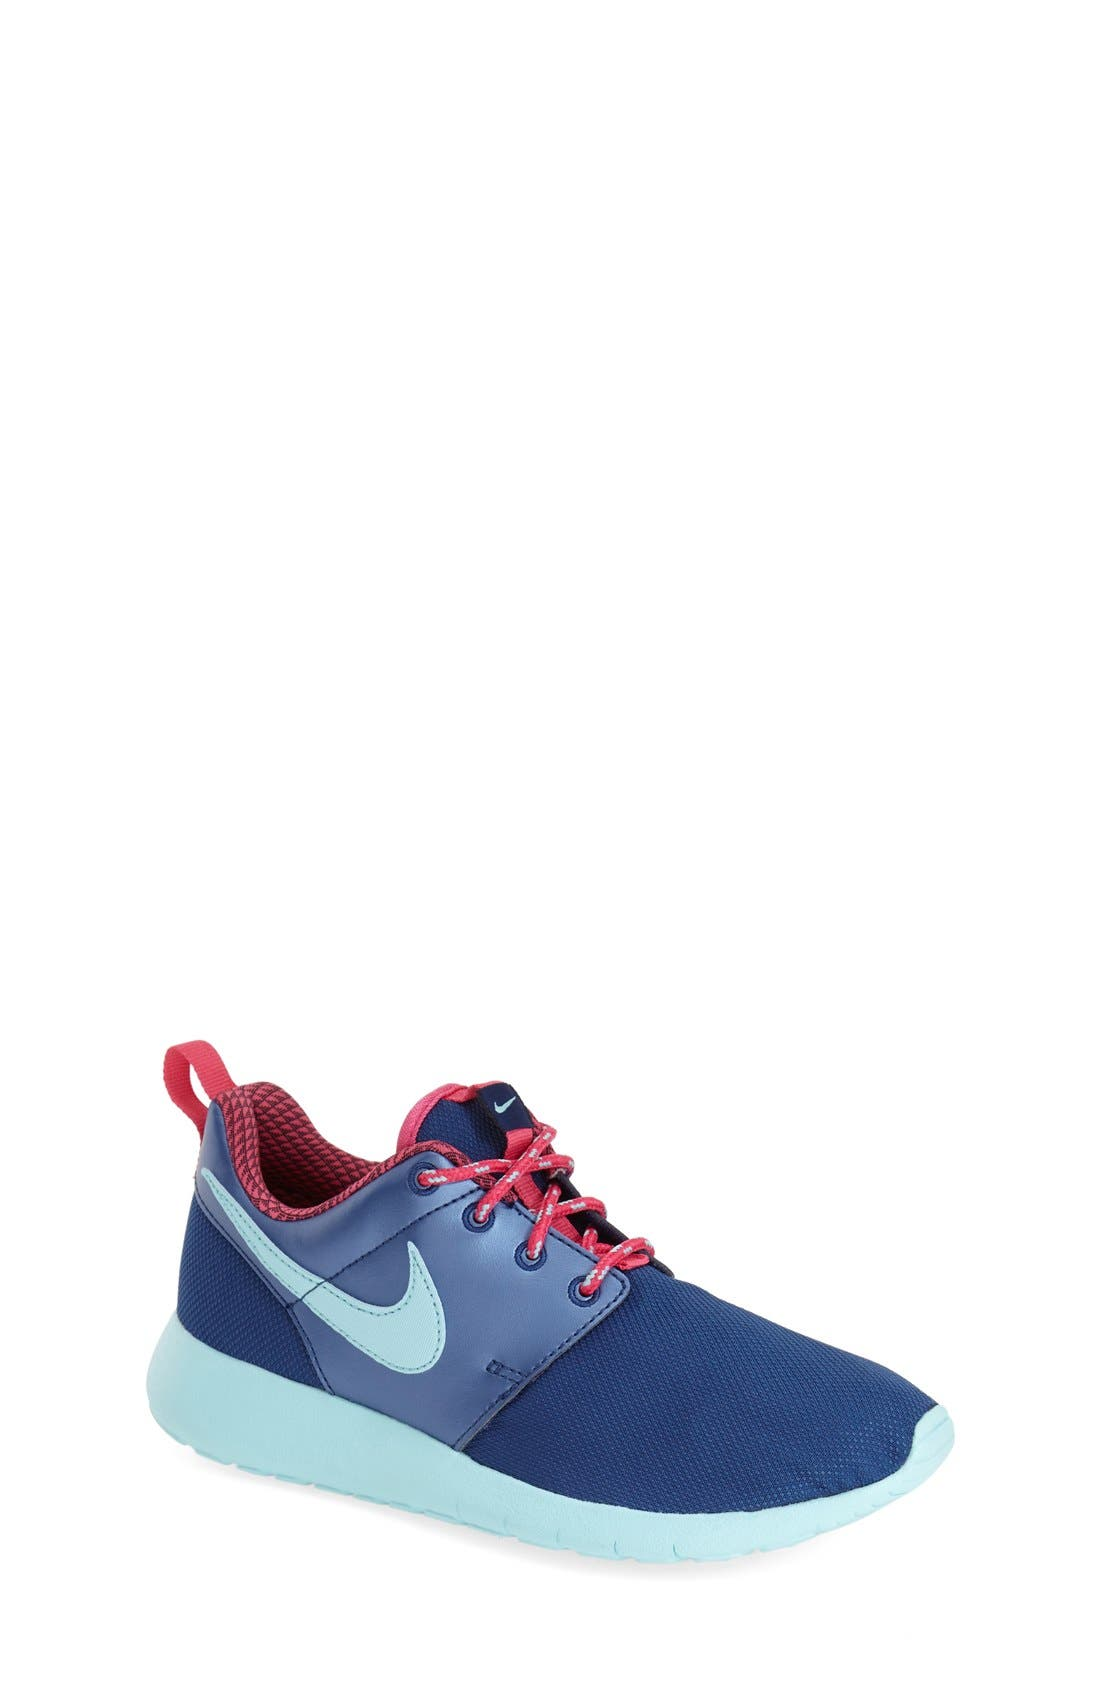 'Roshe Run' Athletic Shoe,                             Main thumbnail 34, color,